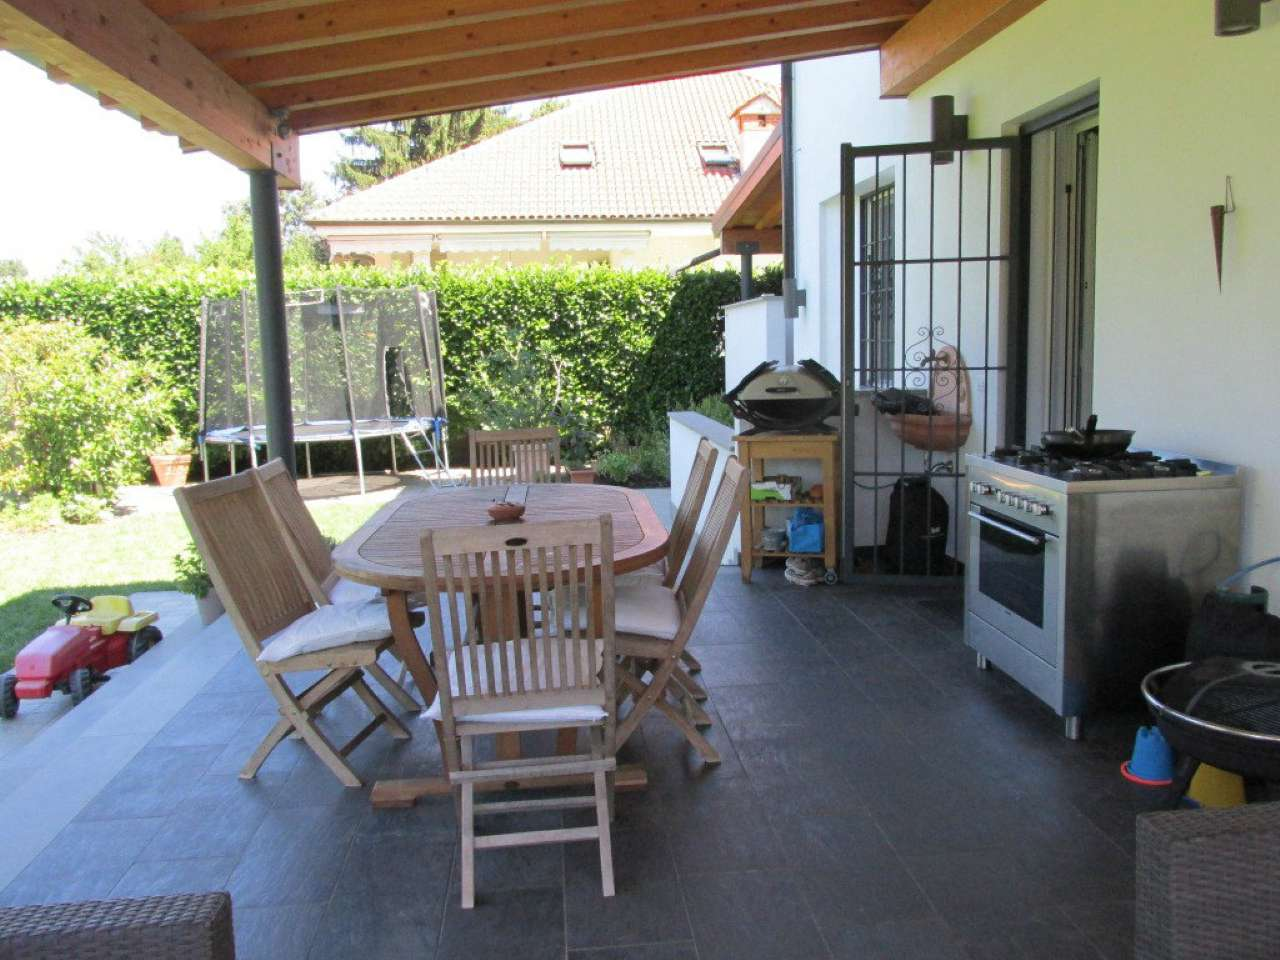 Villa in Vendita a Segrate: 5 locali, 300 mq - Foto 8